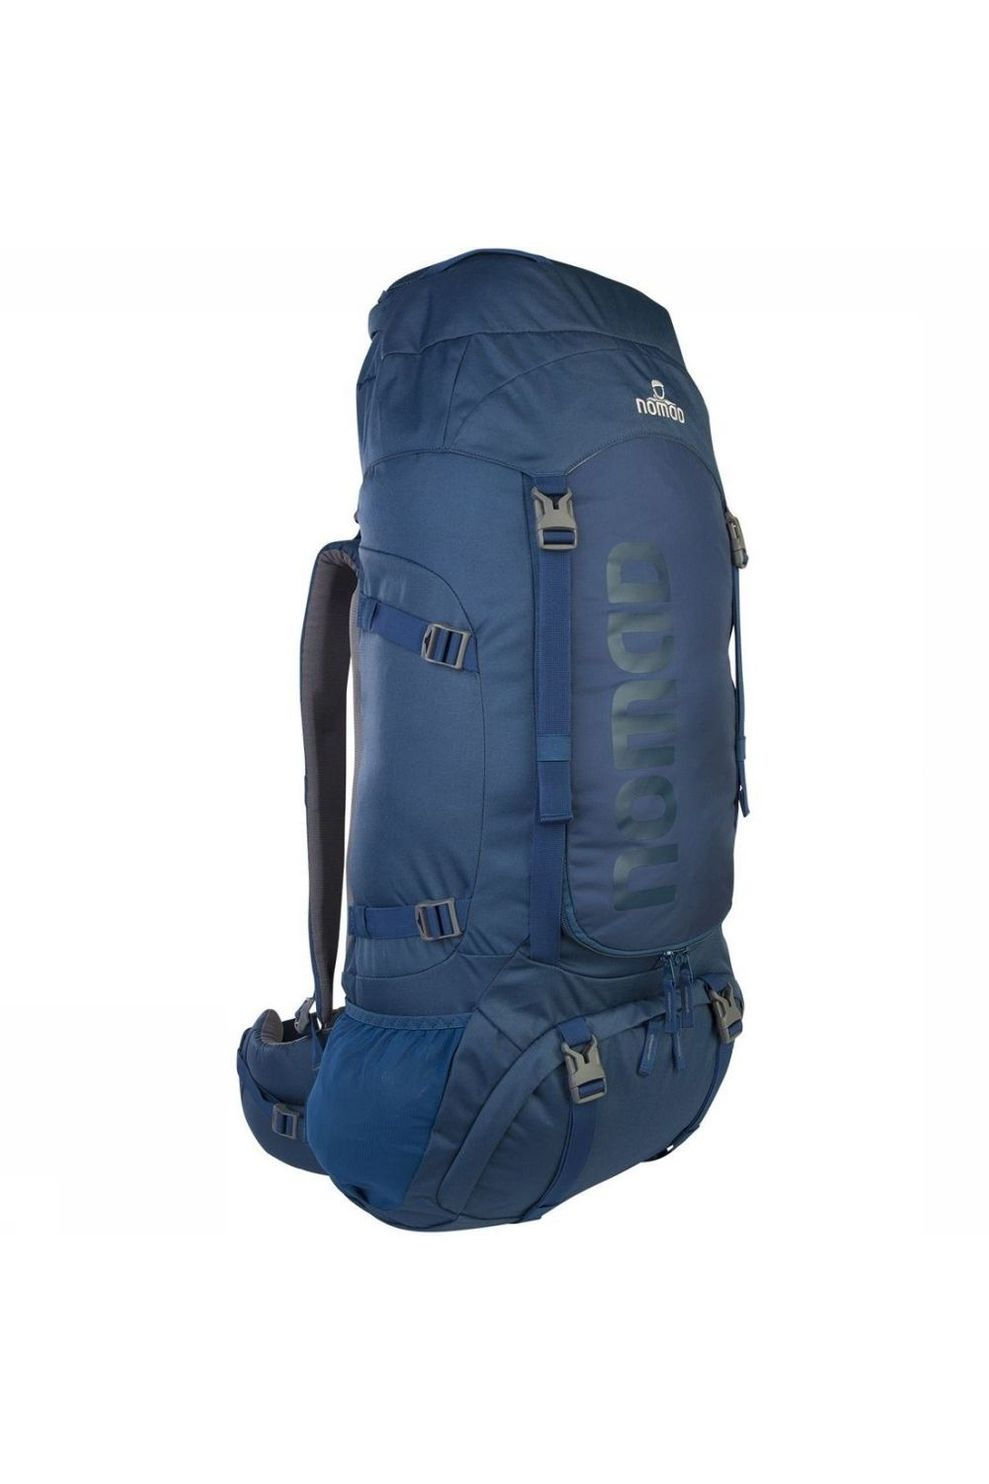 Nomad Rugzak Batura 70 L - Blauw